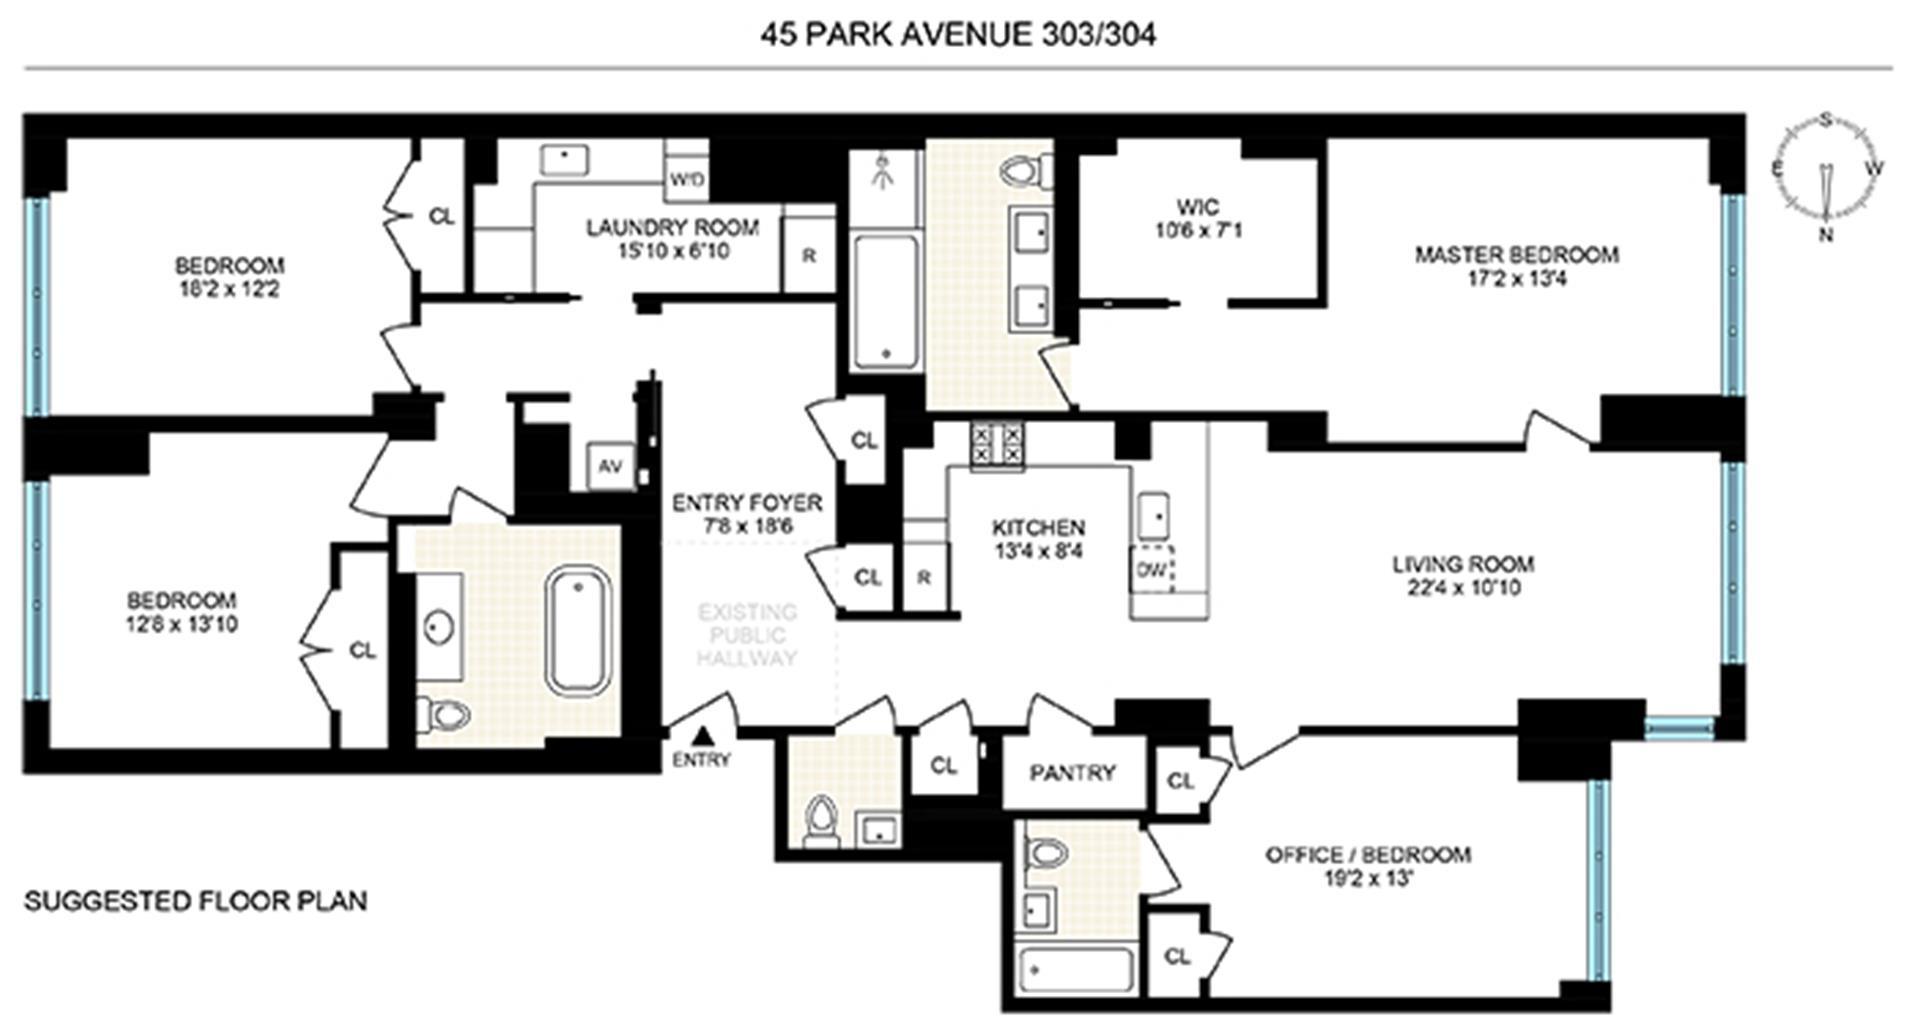 Floor plan of 45 Park Avenue, 303/304 - Murray Hill, New York